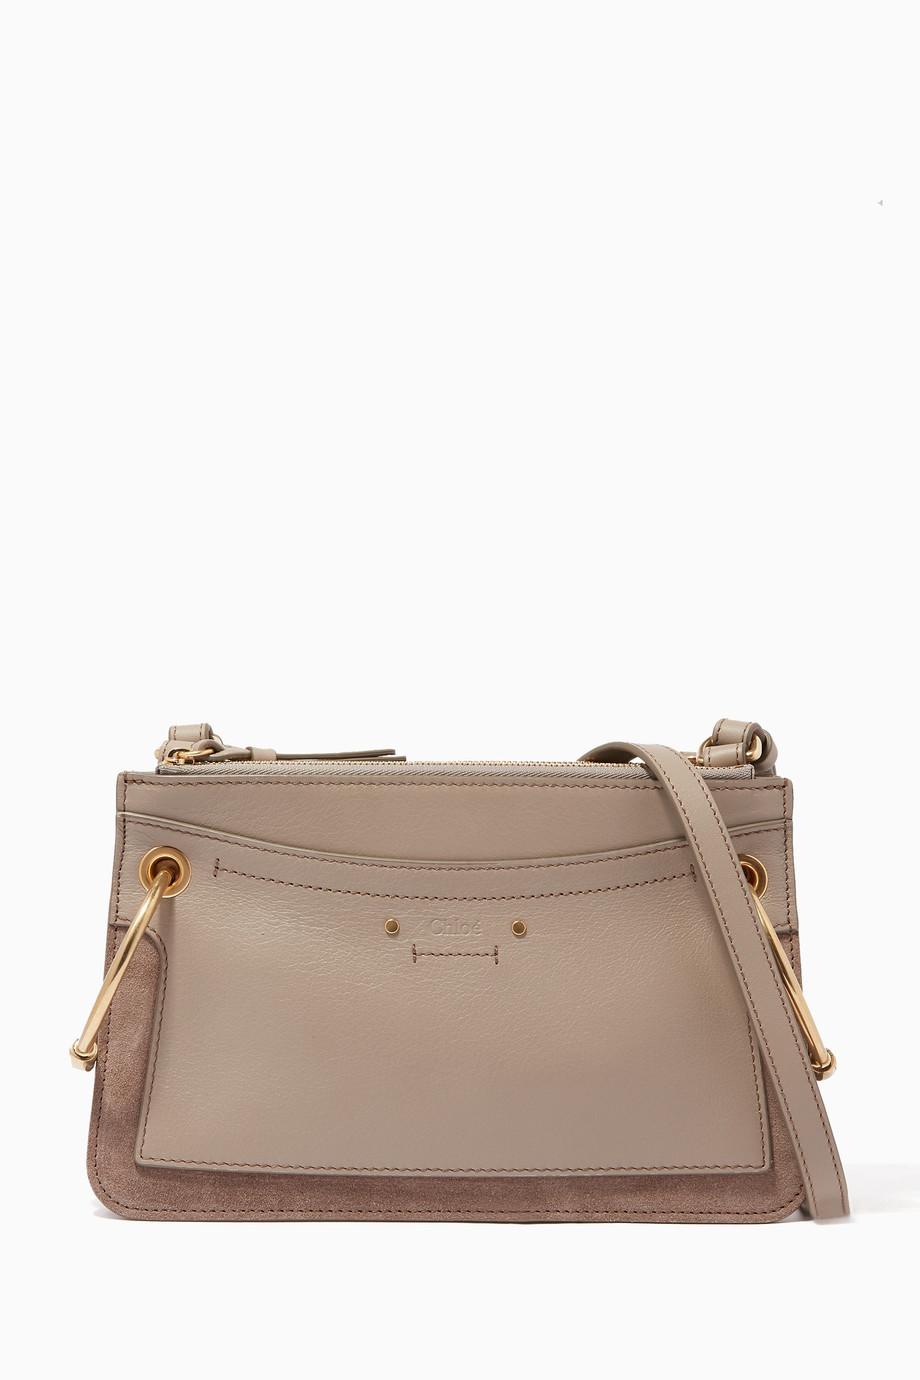 Hemline Bag Chain 120cm Gold